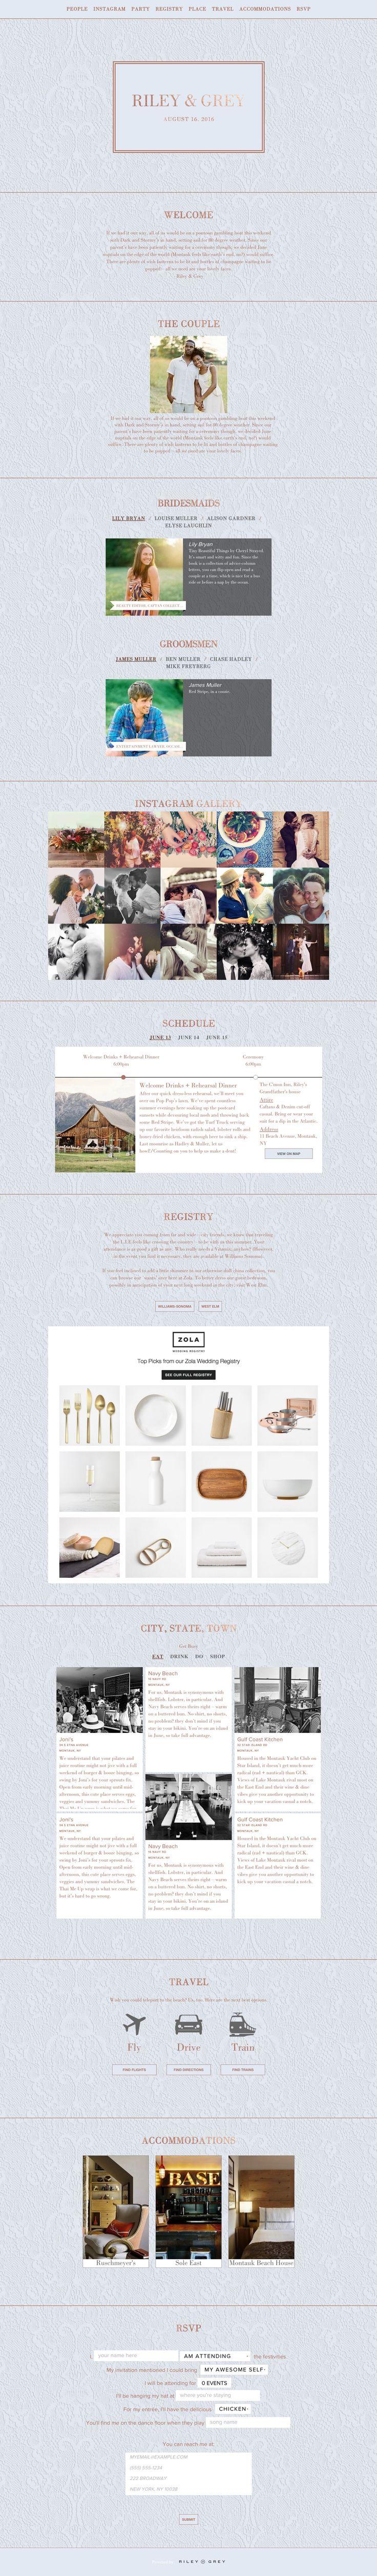 """Duchess"" robins egg blue wedding website design by Riley & Grey (graphic design, wedding planning, wedding website examples)"